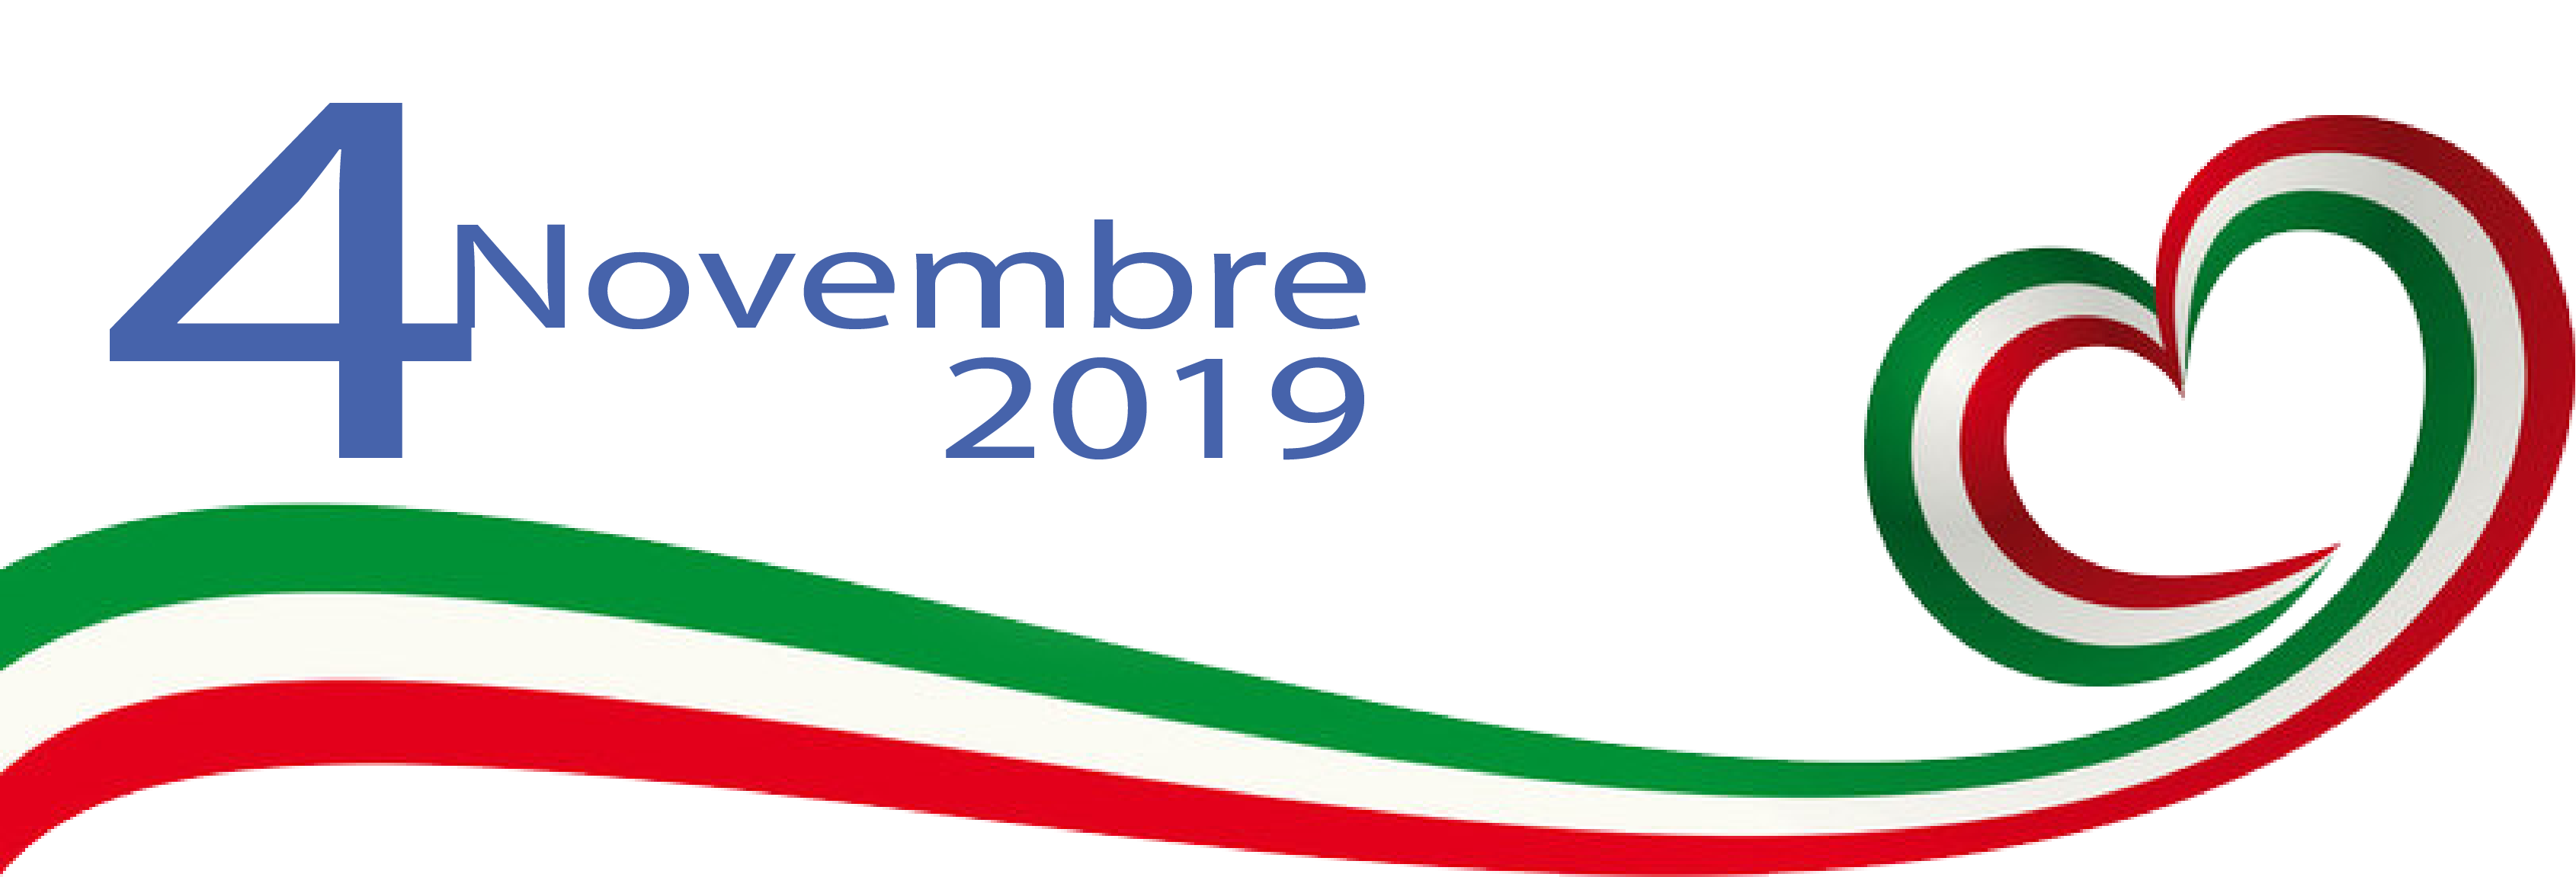 4 novembre 2019